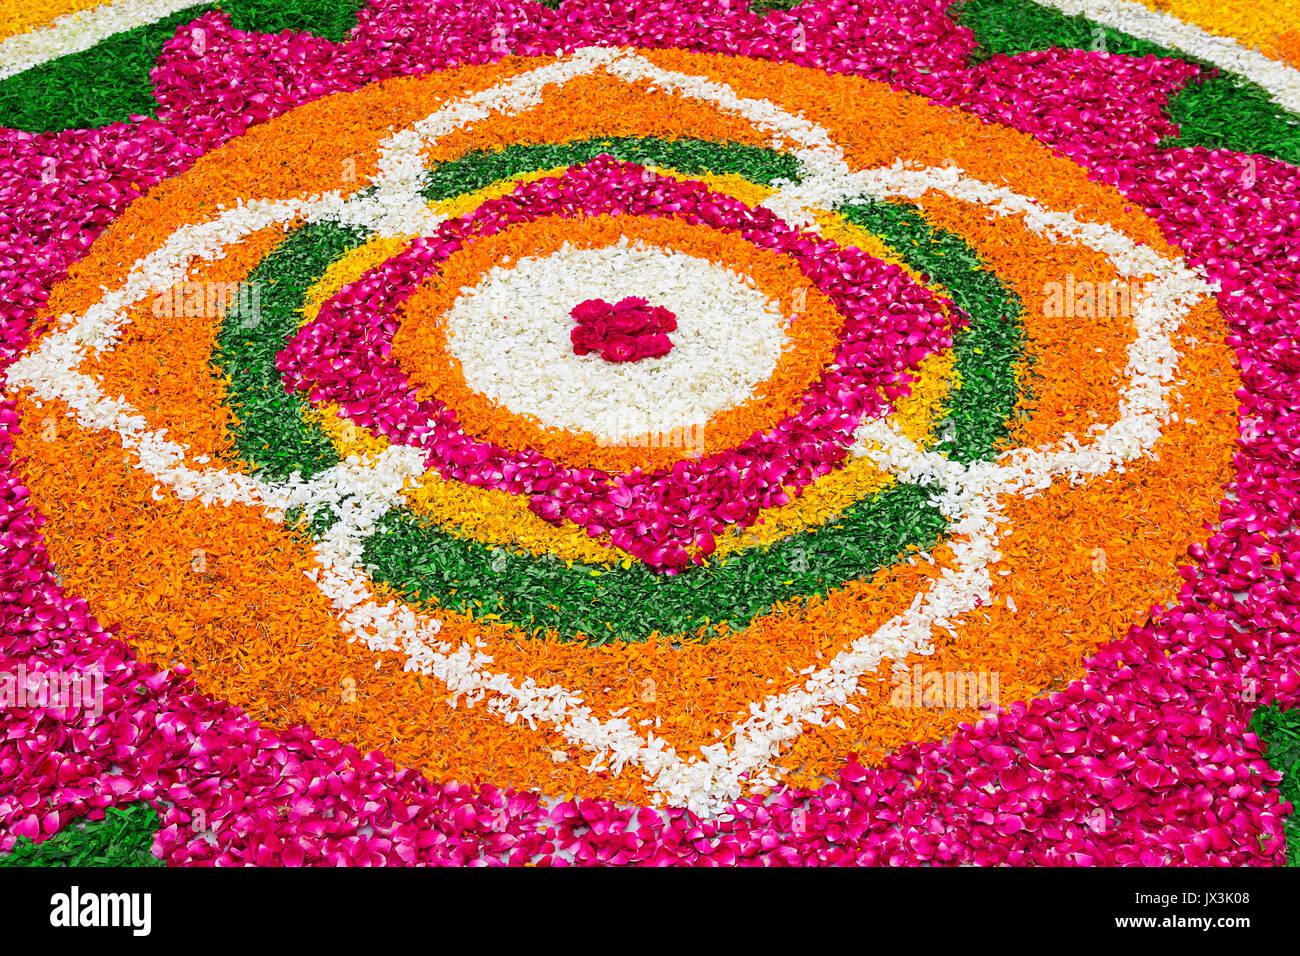 Flowers Rangoli Designs Petals Rangoli Designs for Diwali Festival ... for Flower Rangoli Designs For Diwali  45ifm